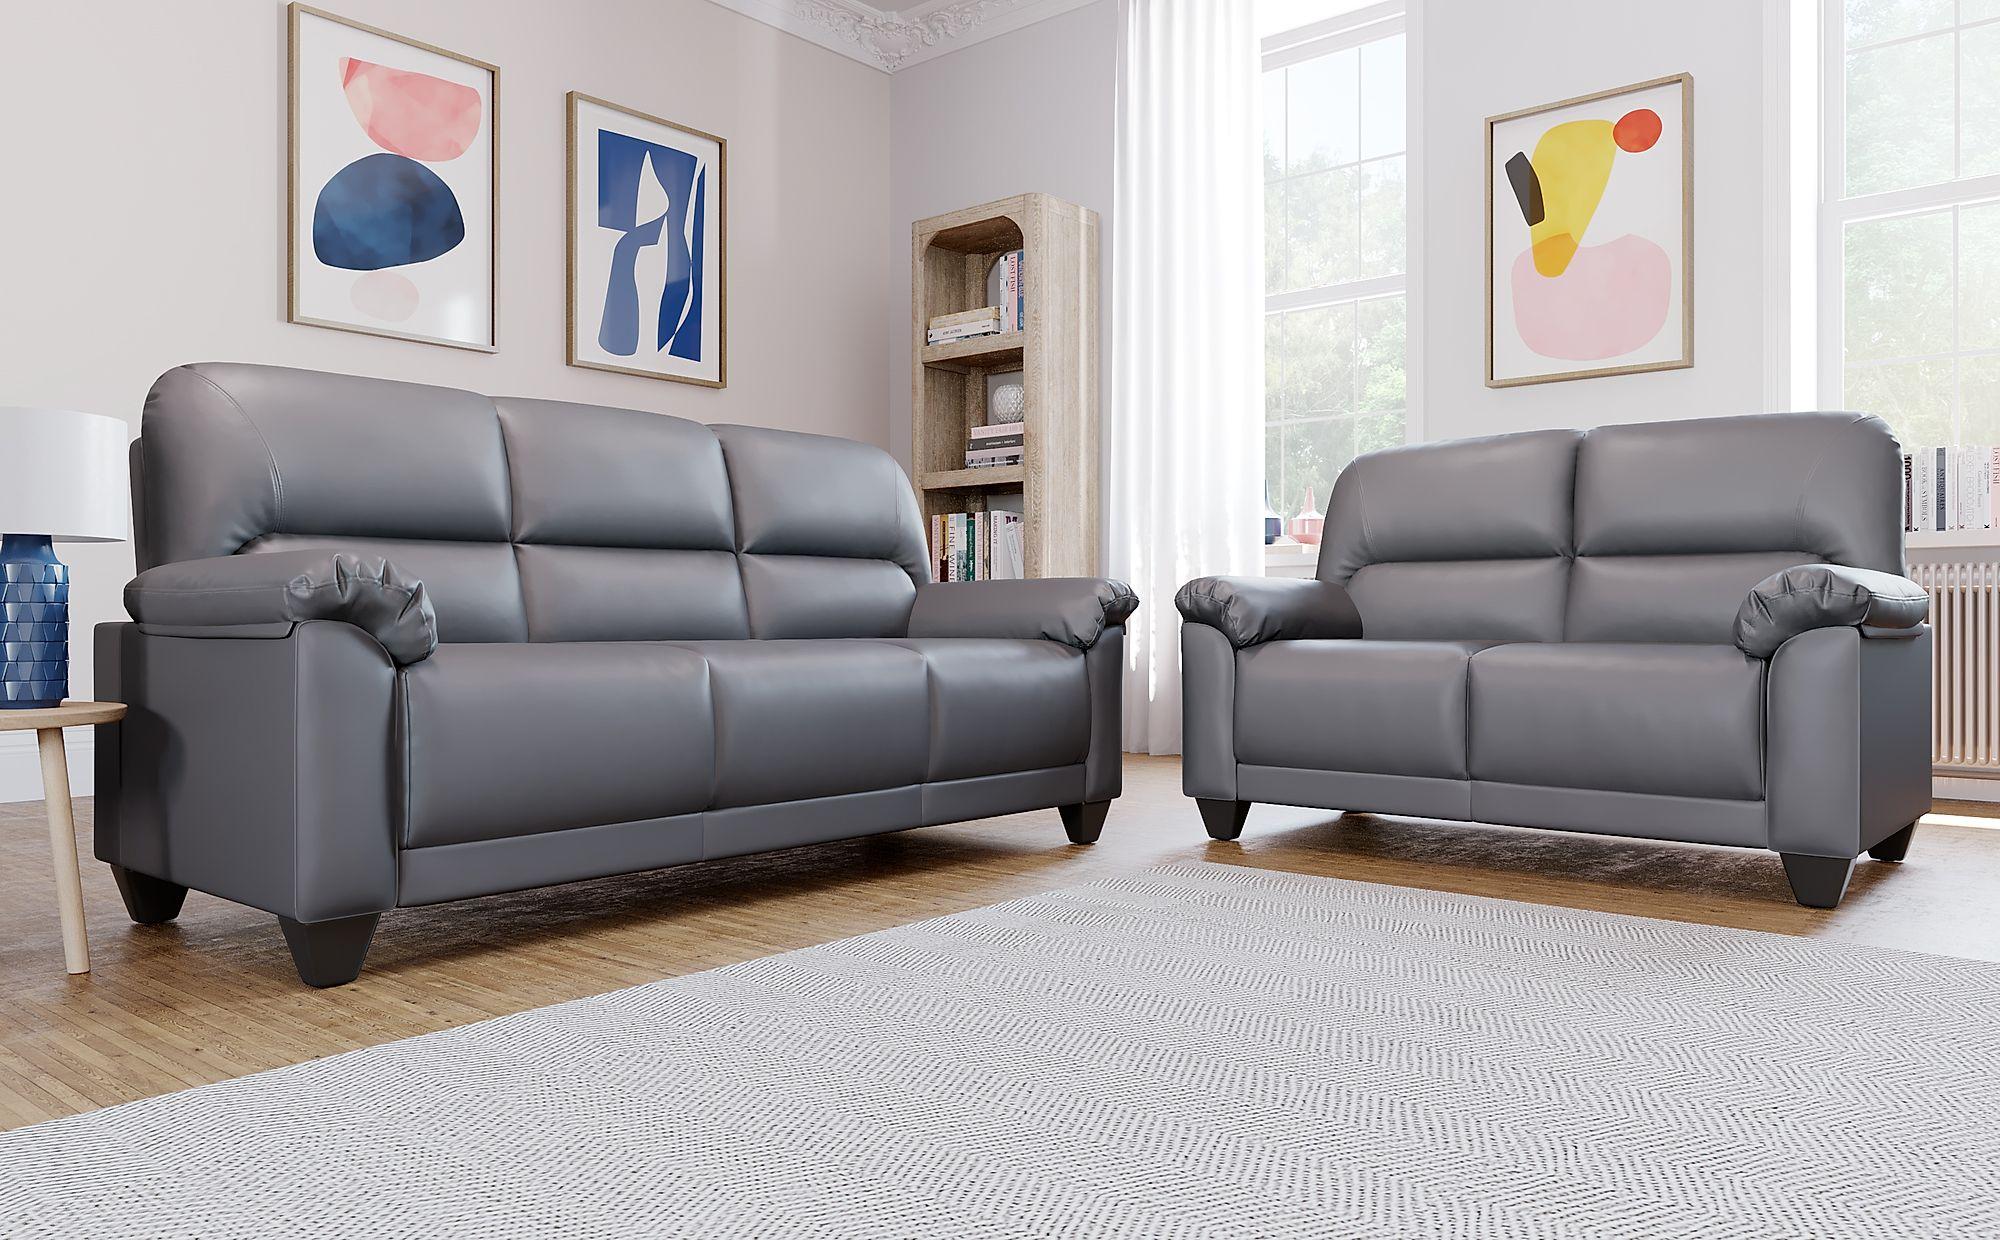 Kenton Small Grey Leather Sofa 3 2 Seater Only 163 499 98